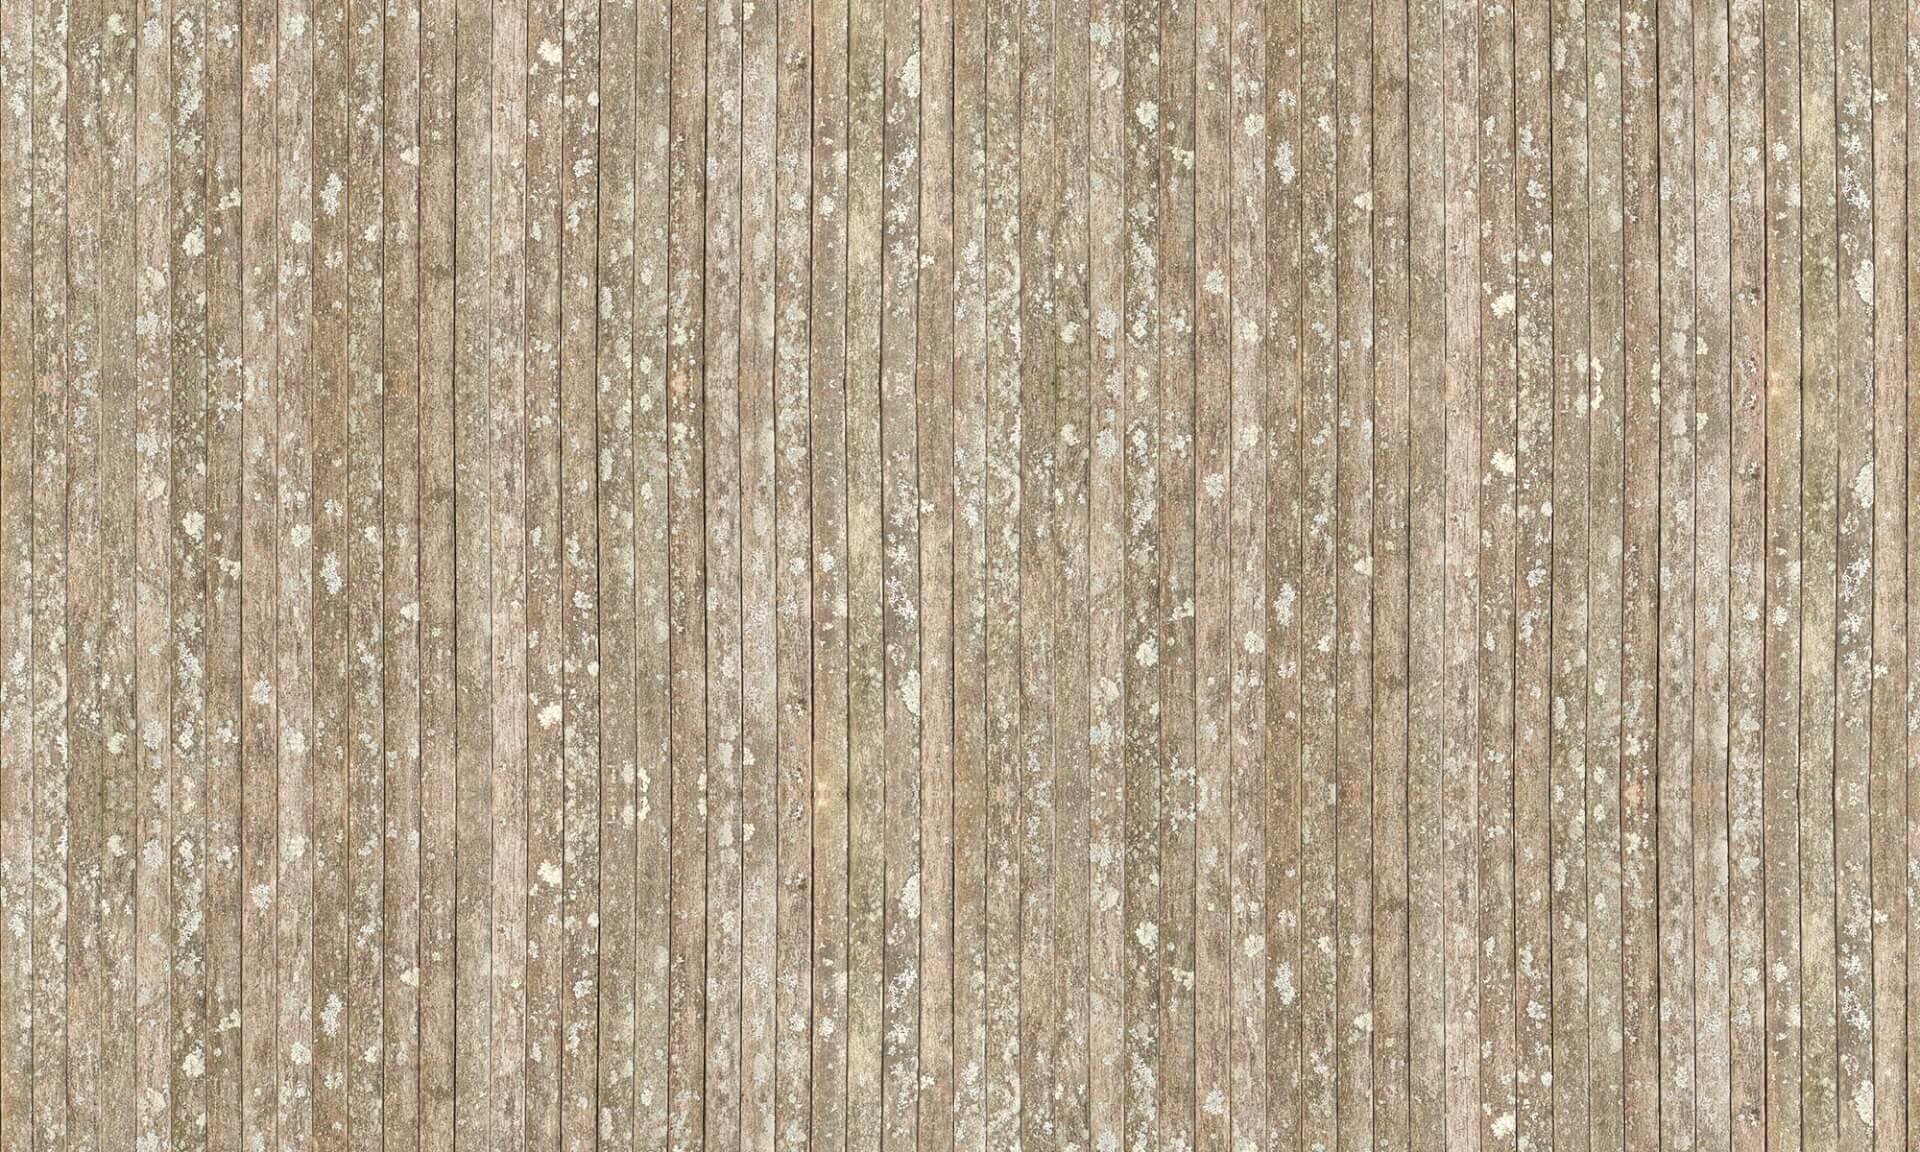 Rustic (Slats or teak and lichen)